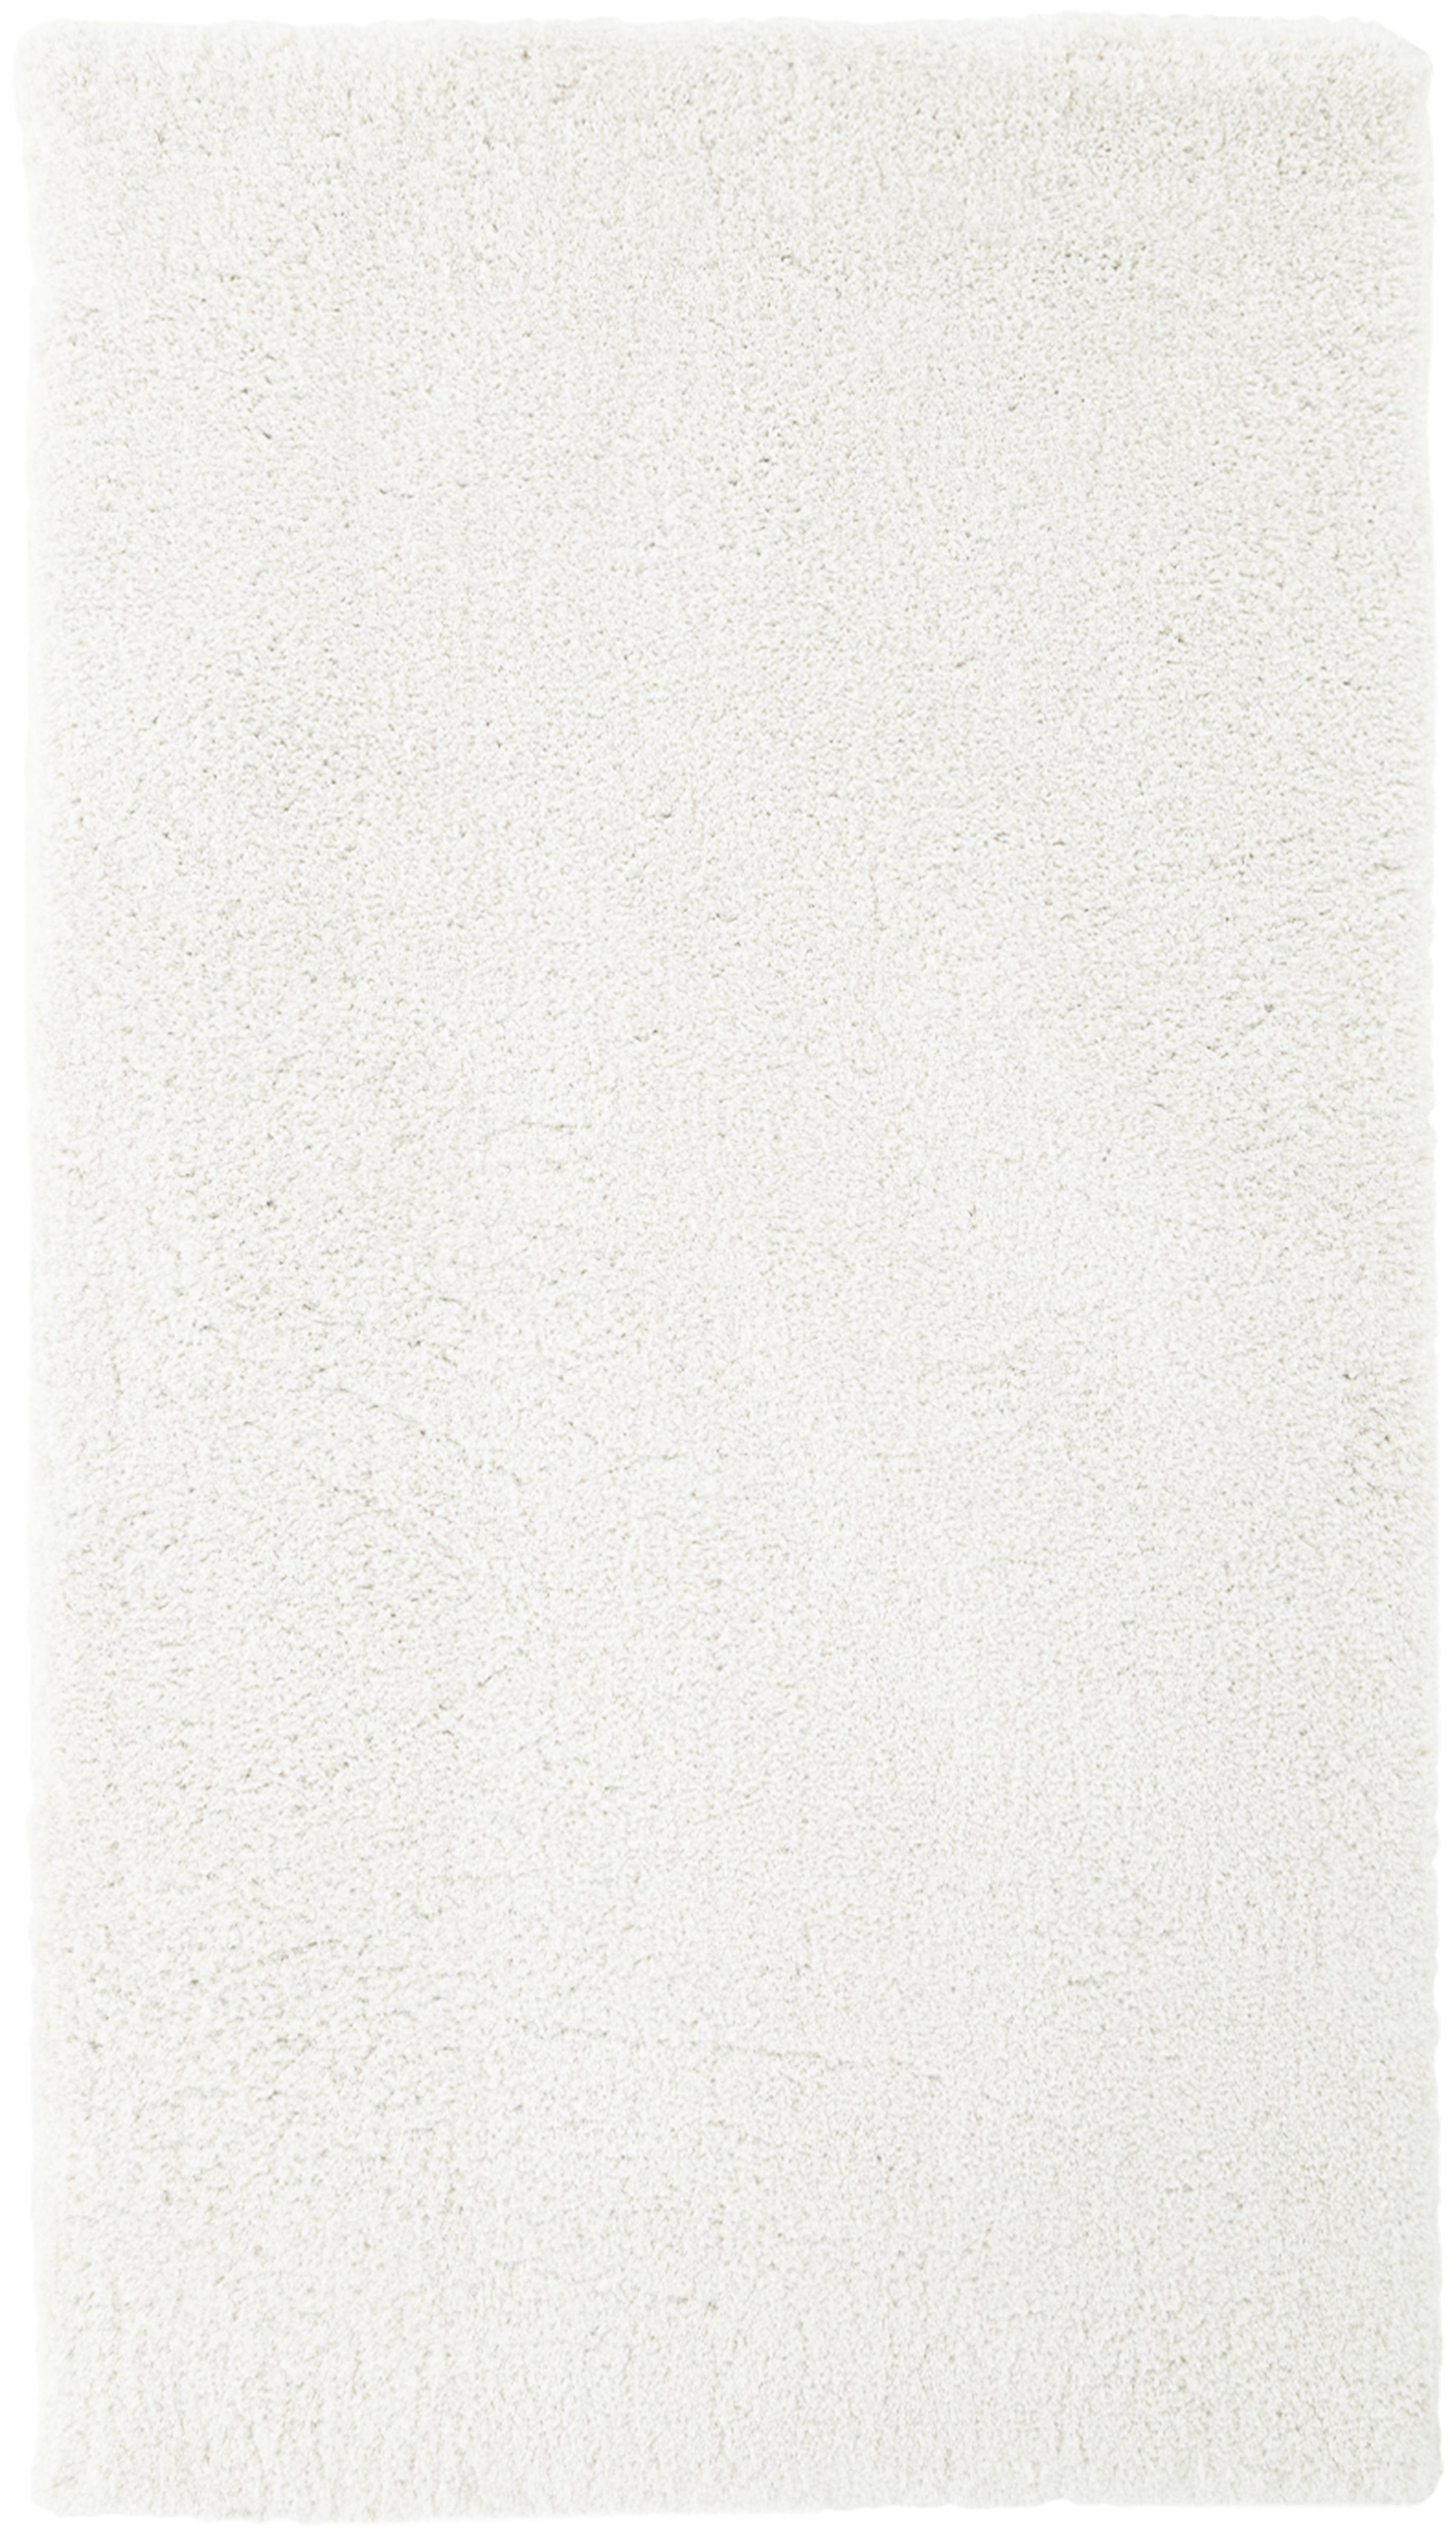 Načechraný koberec svysokým vlasem Leighton, Krémová